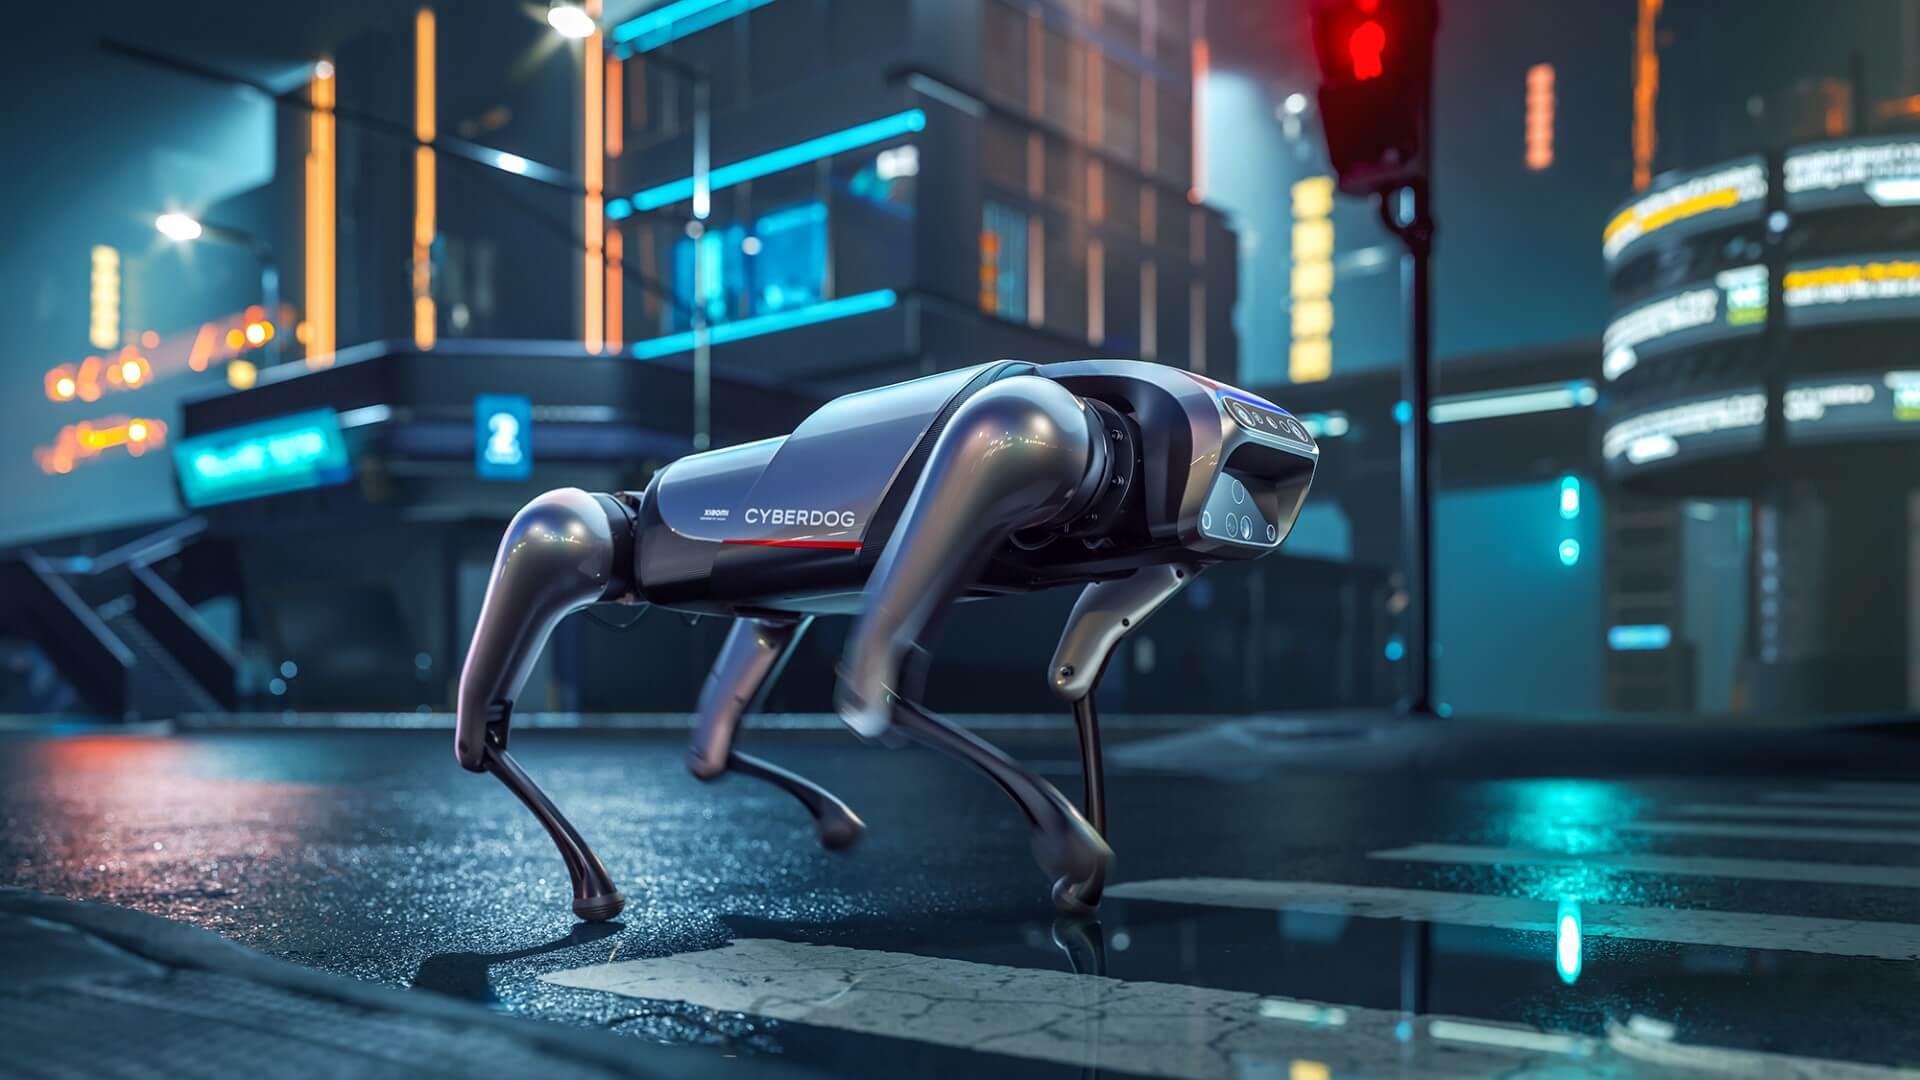 xiaomi cyberdog 2